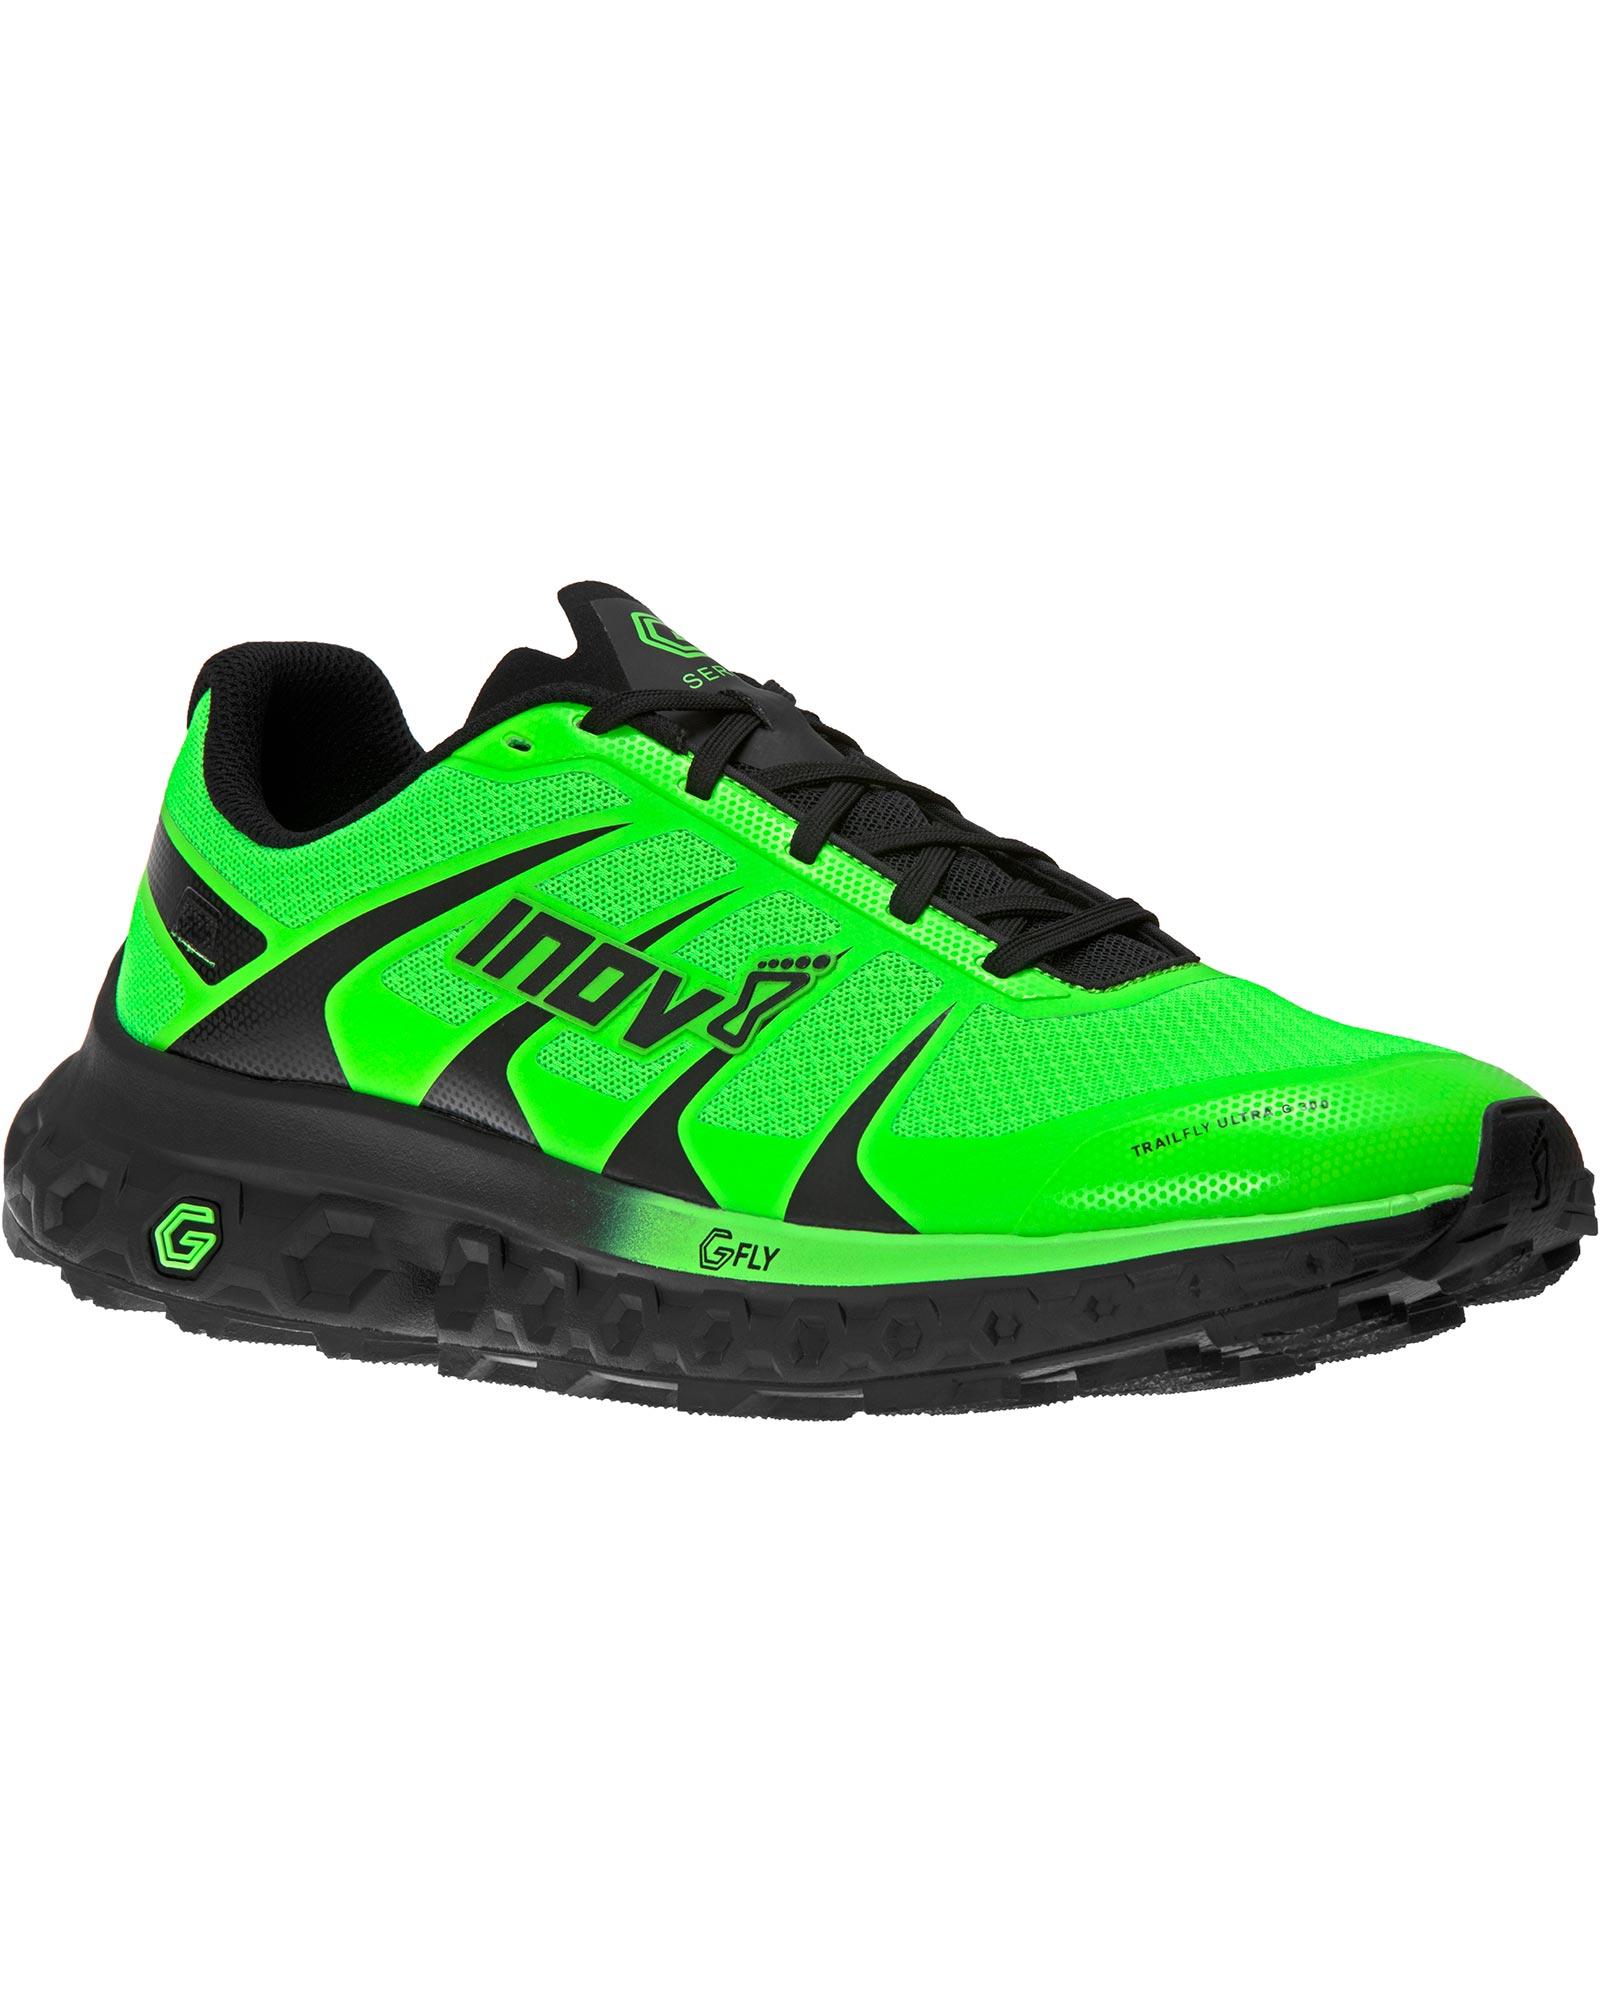 Inov-8 TrailFly Ultra G 300 Max Men's Shoes 0